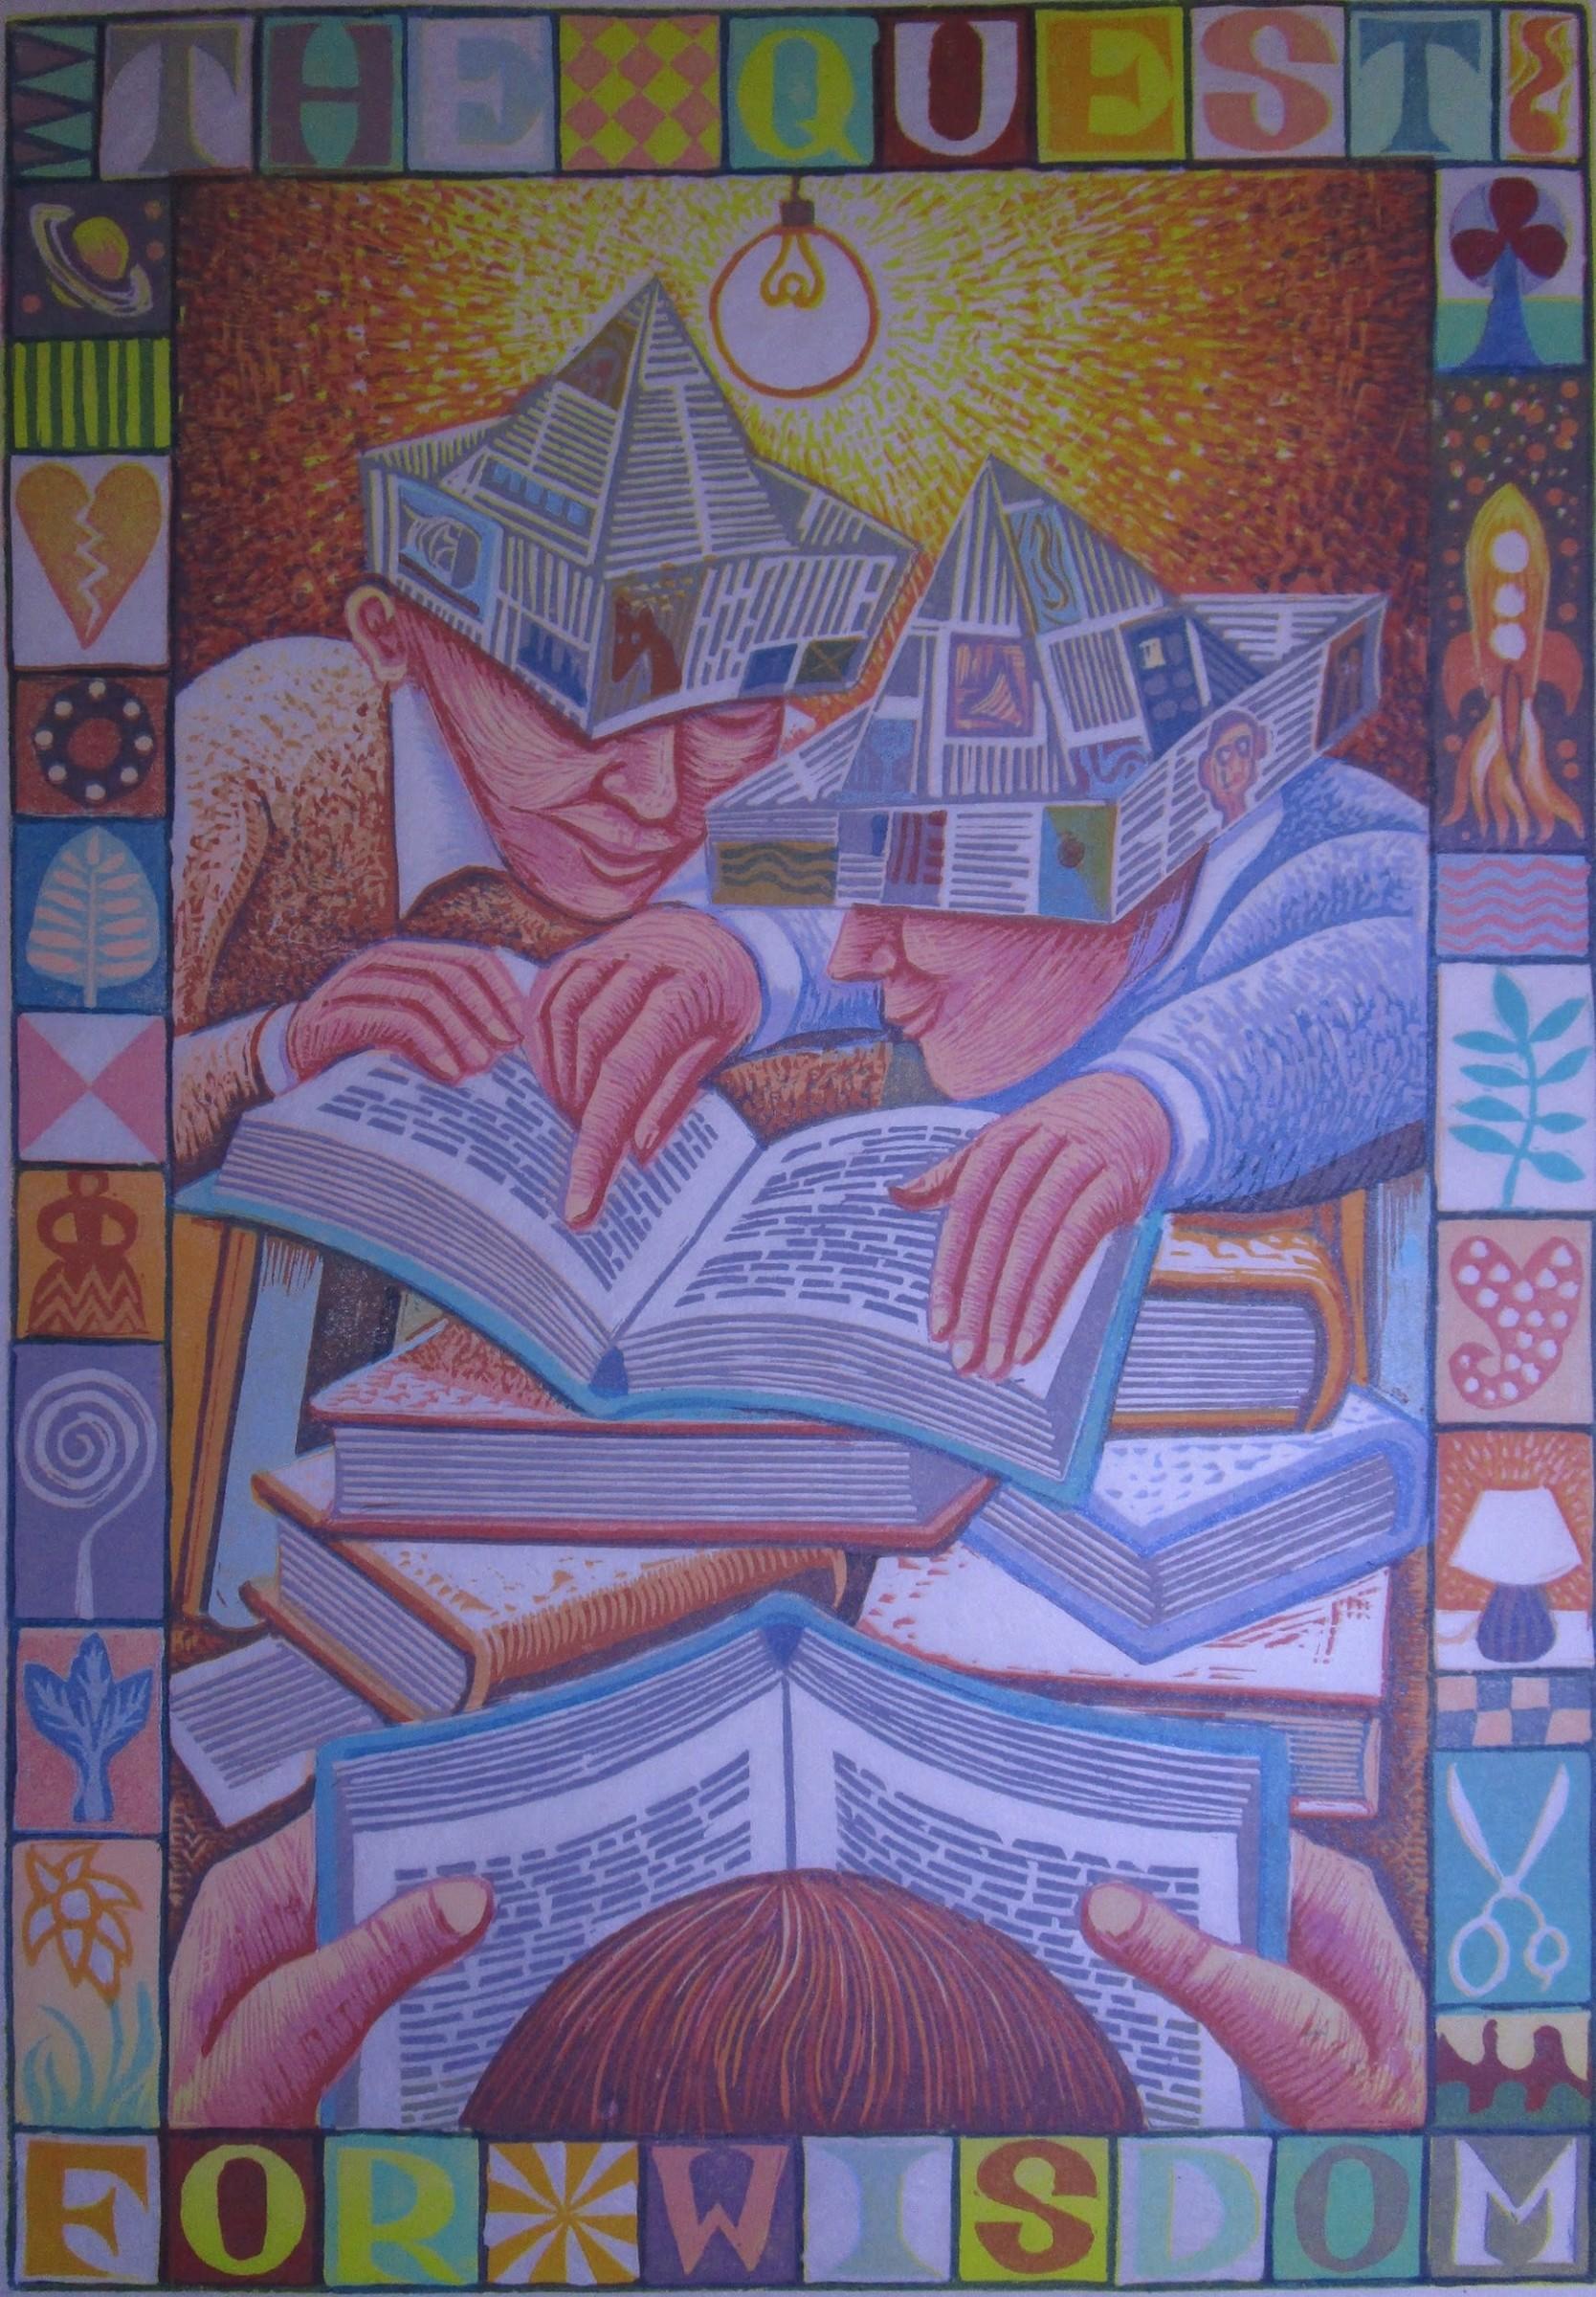 "<span class=""link fancybox-details-link""><a href=""/artists/30-jim-anderson-re/works/10781/"">View Detail Page</a></span><div class=""artist""><span class=""artist""><strong>Jim Anderson RE</strong></span></div><div class=""title""><em>Paper Hats (the quest for wisdom)</em></div><div class=""medium"">linocut</div><div class=""dimensions"">31 x 21 cm image size</div><div class=""edition_details"">edition of 12</div><div class=""price"">£190.00 unframed</div>"